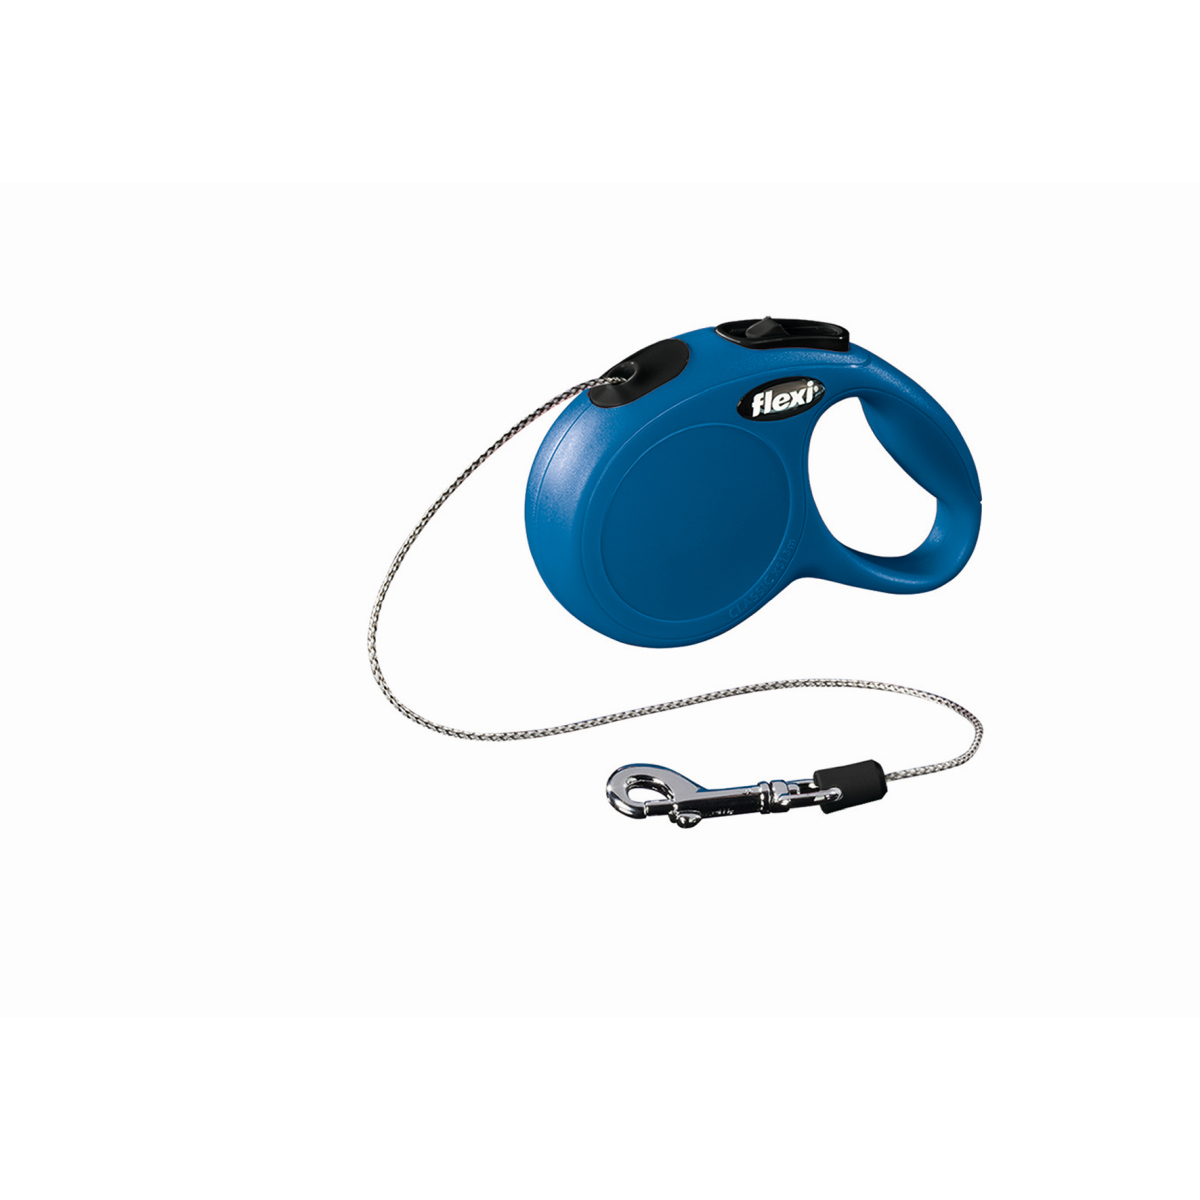 Flexi - new classic cord xs - 3 m blauw